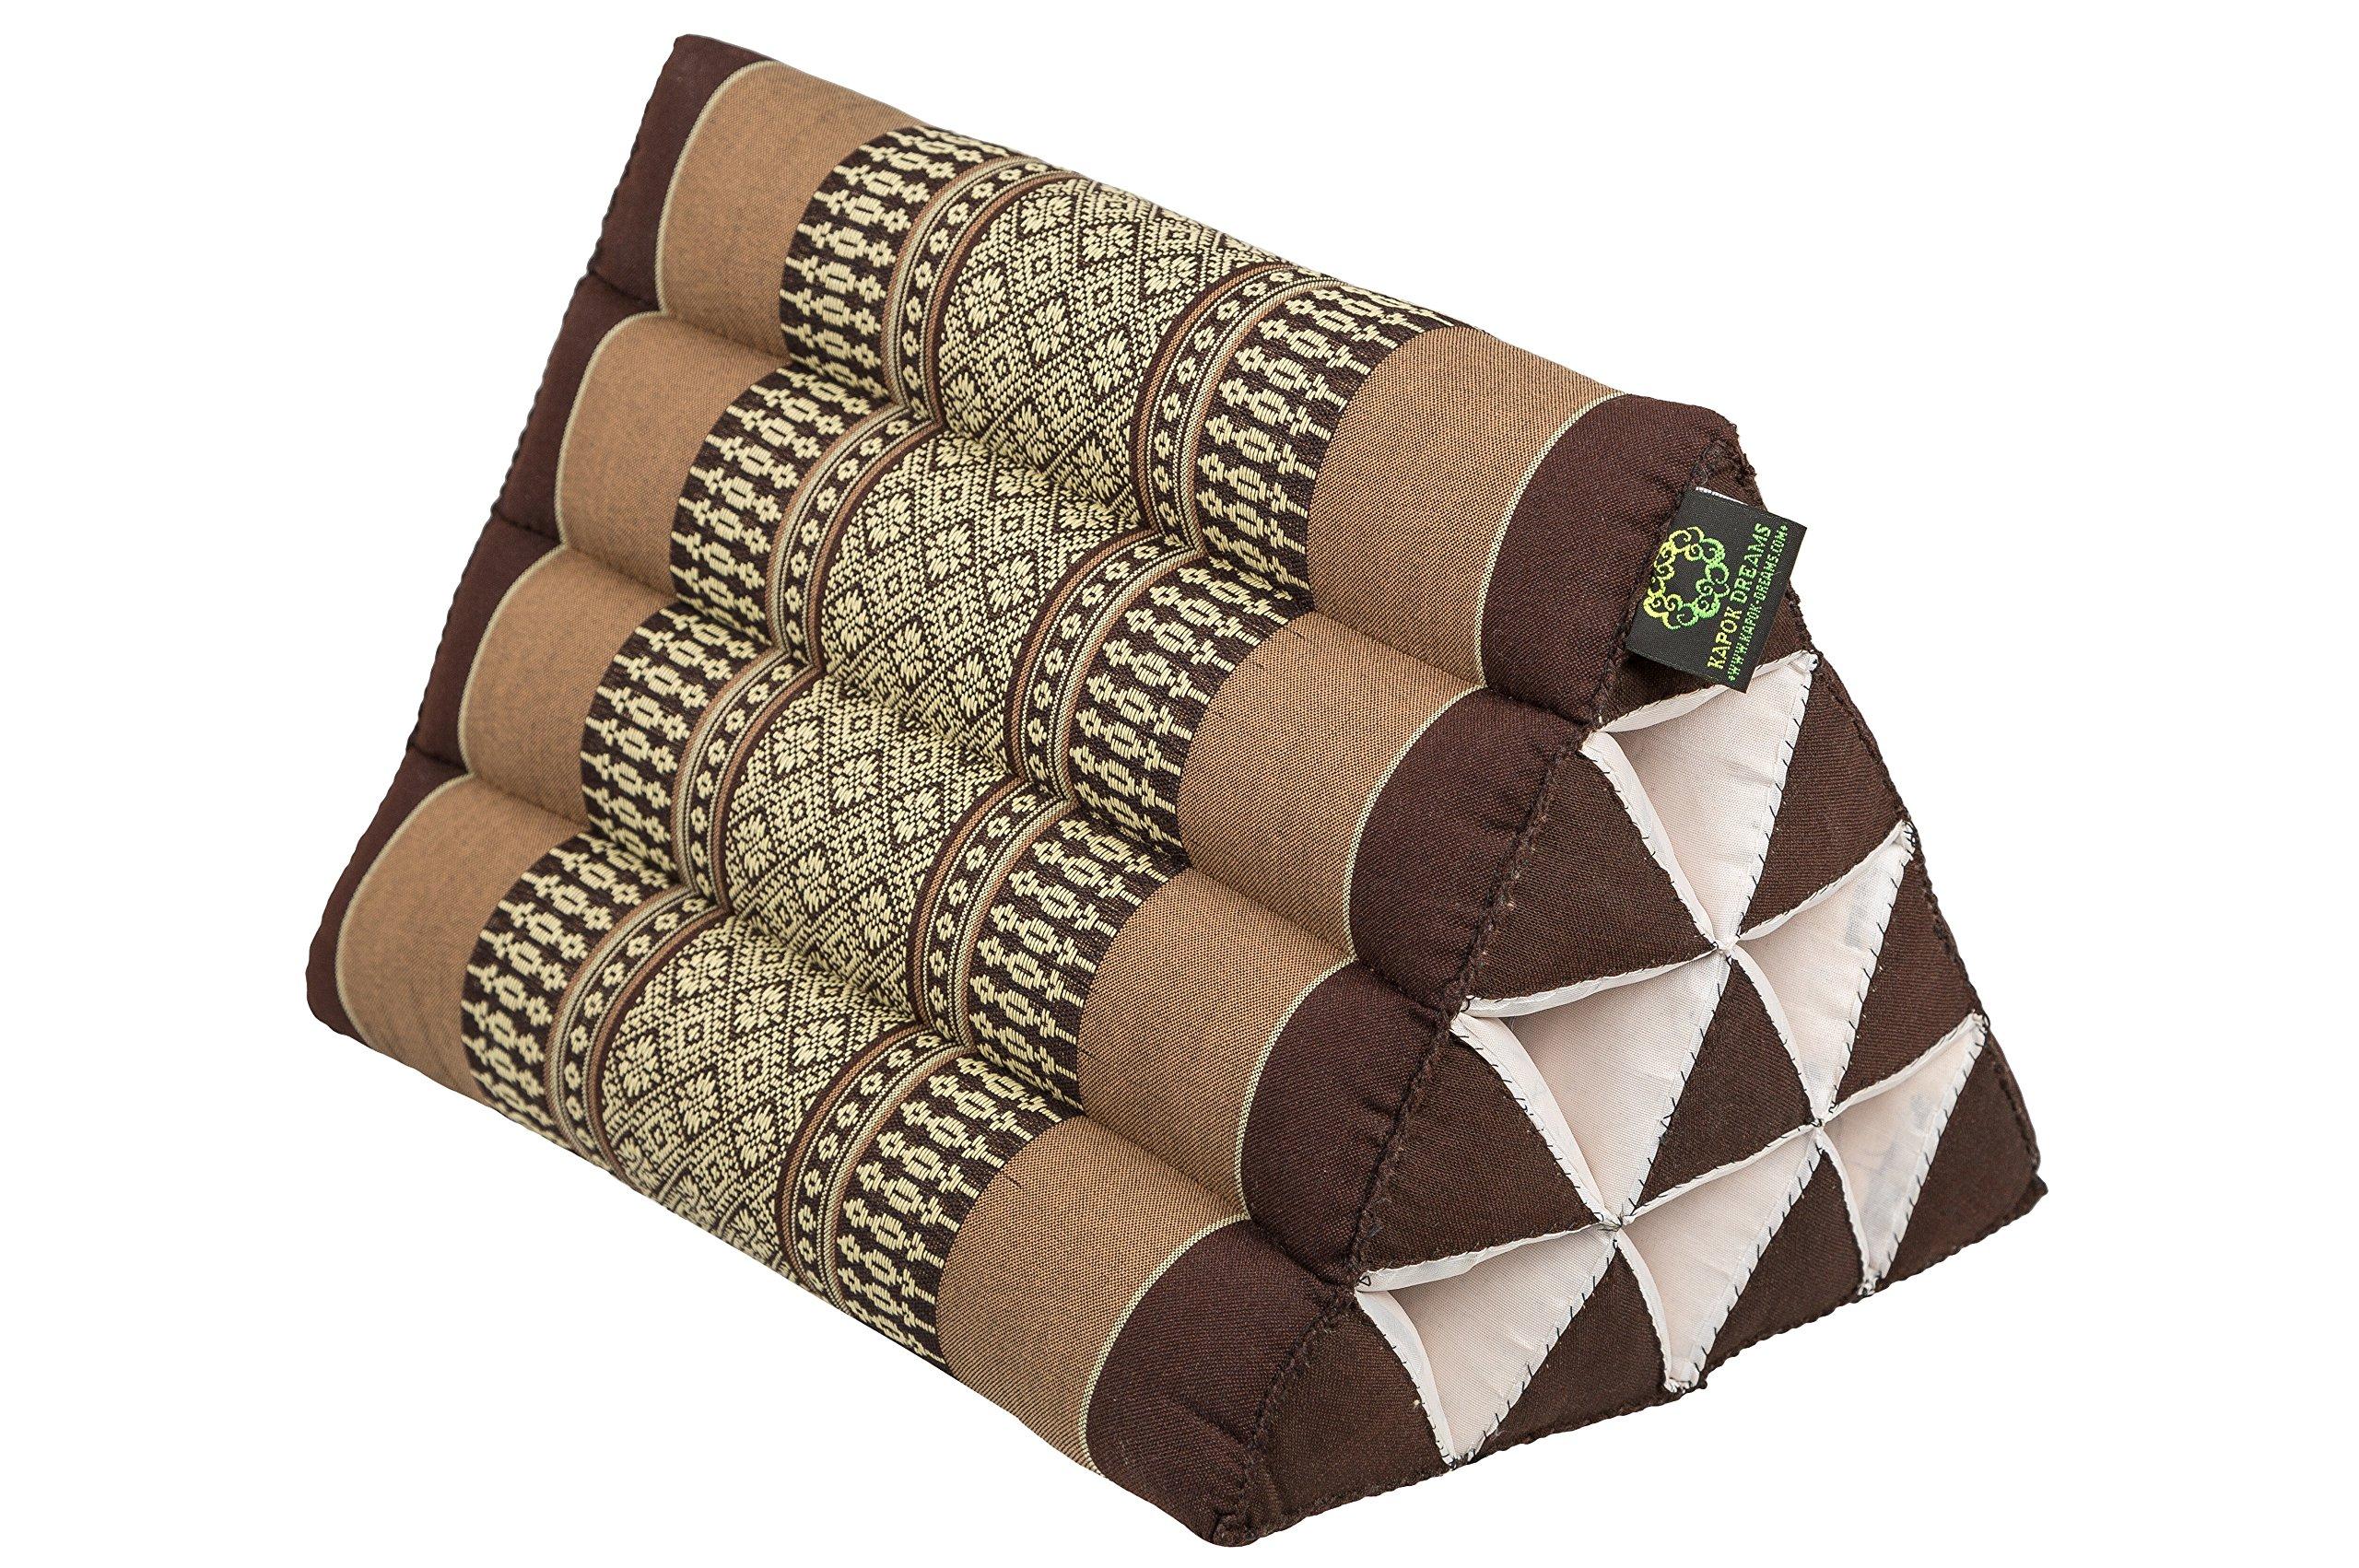 Kapok Dreams Thai Triangle Pillow 13''x8'', Triangular Cushion (Medium Size), 100% Natural Kapok Stuffing, Earthtones Brown Beige